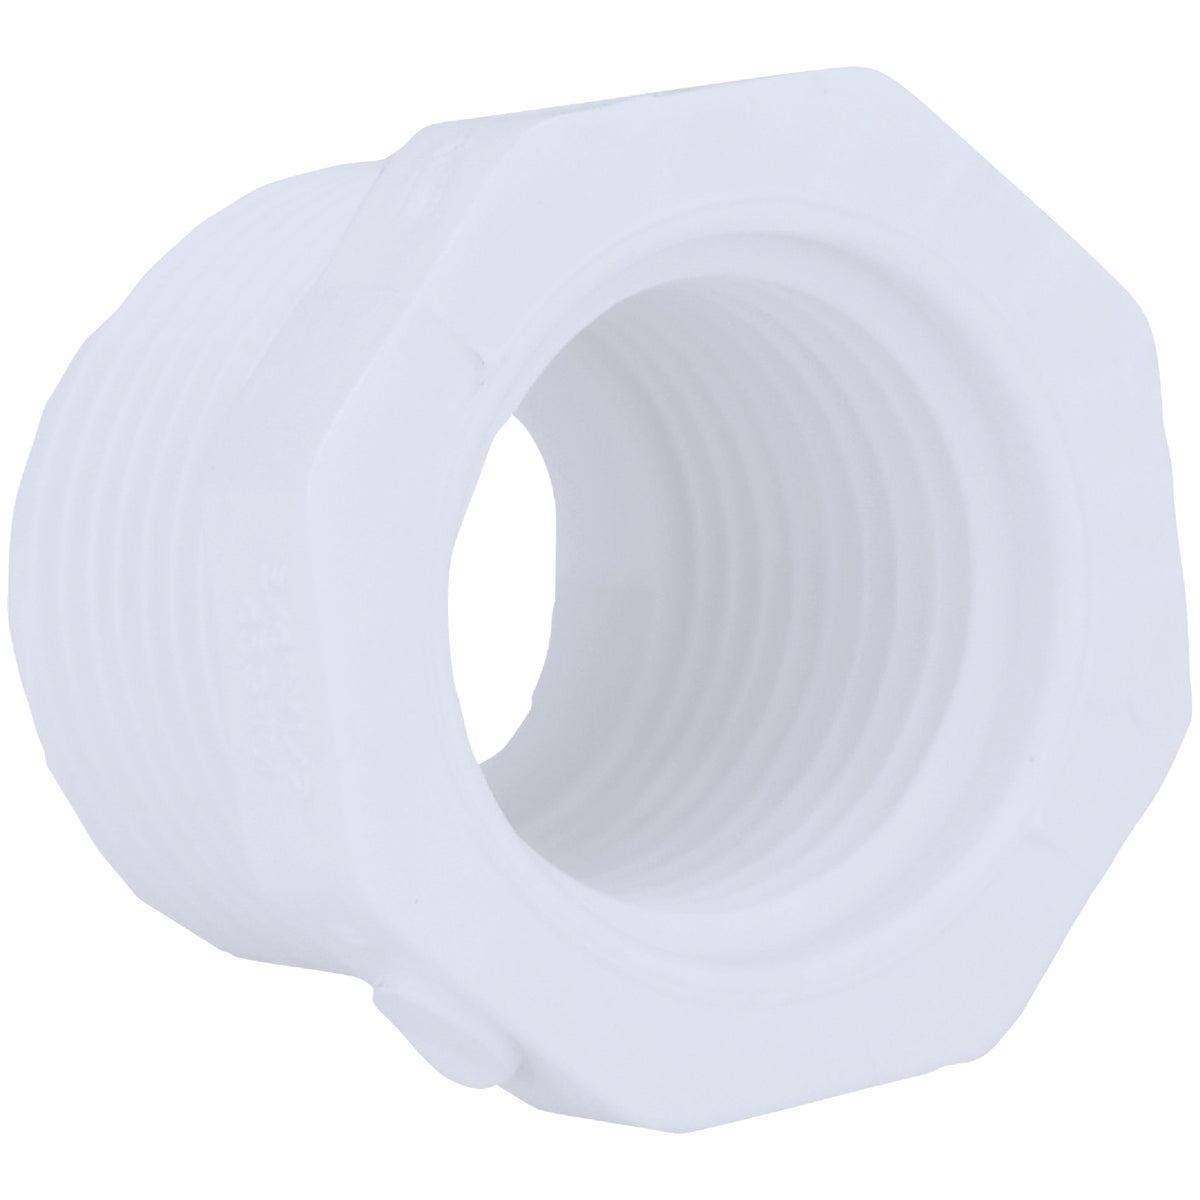 Genova Products 34320 PVC Sch. 40 Threaded Reducing Bushings, 2